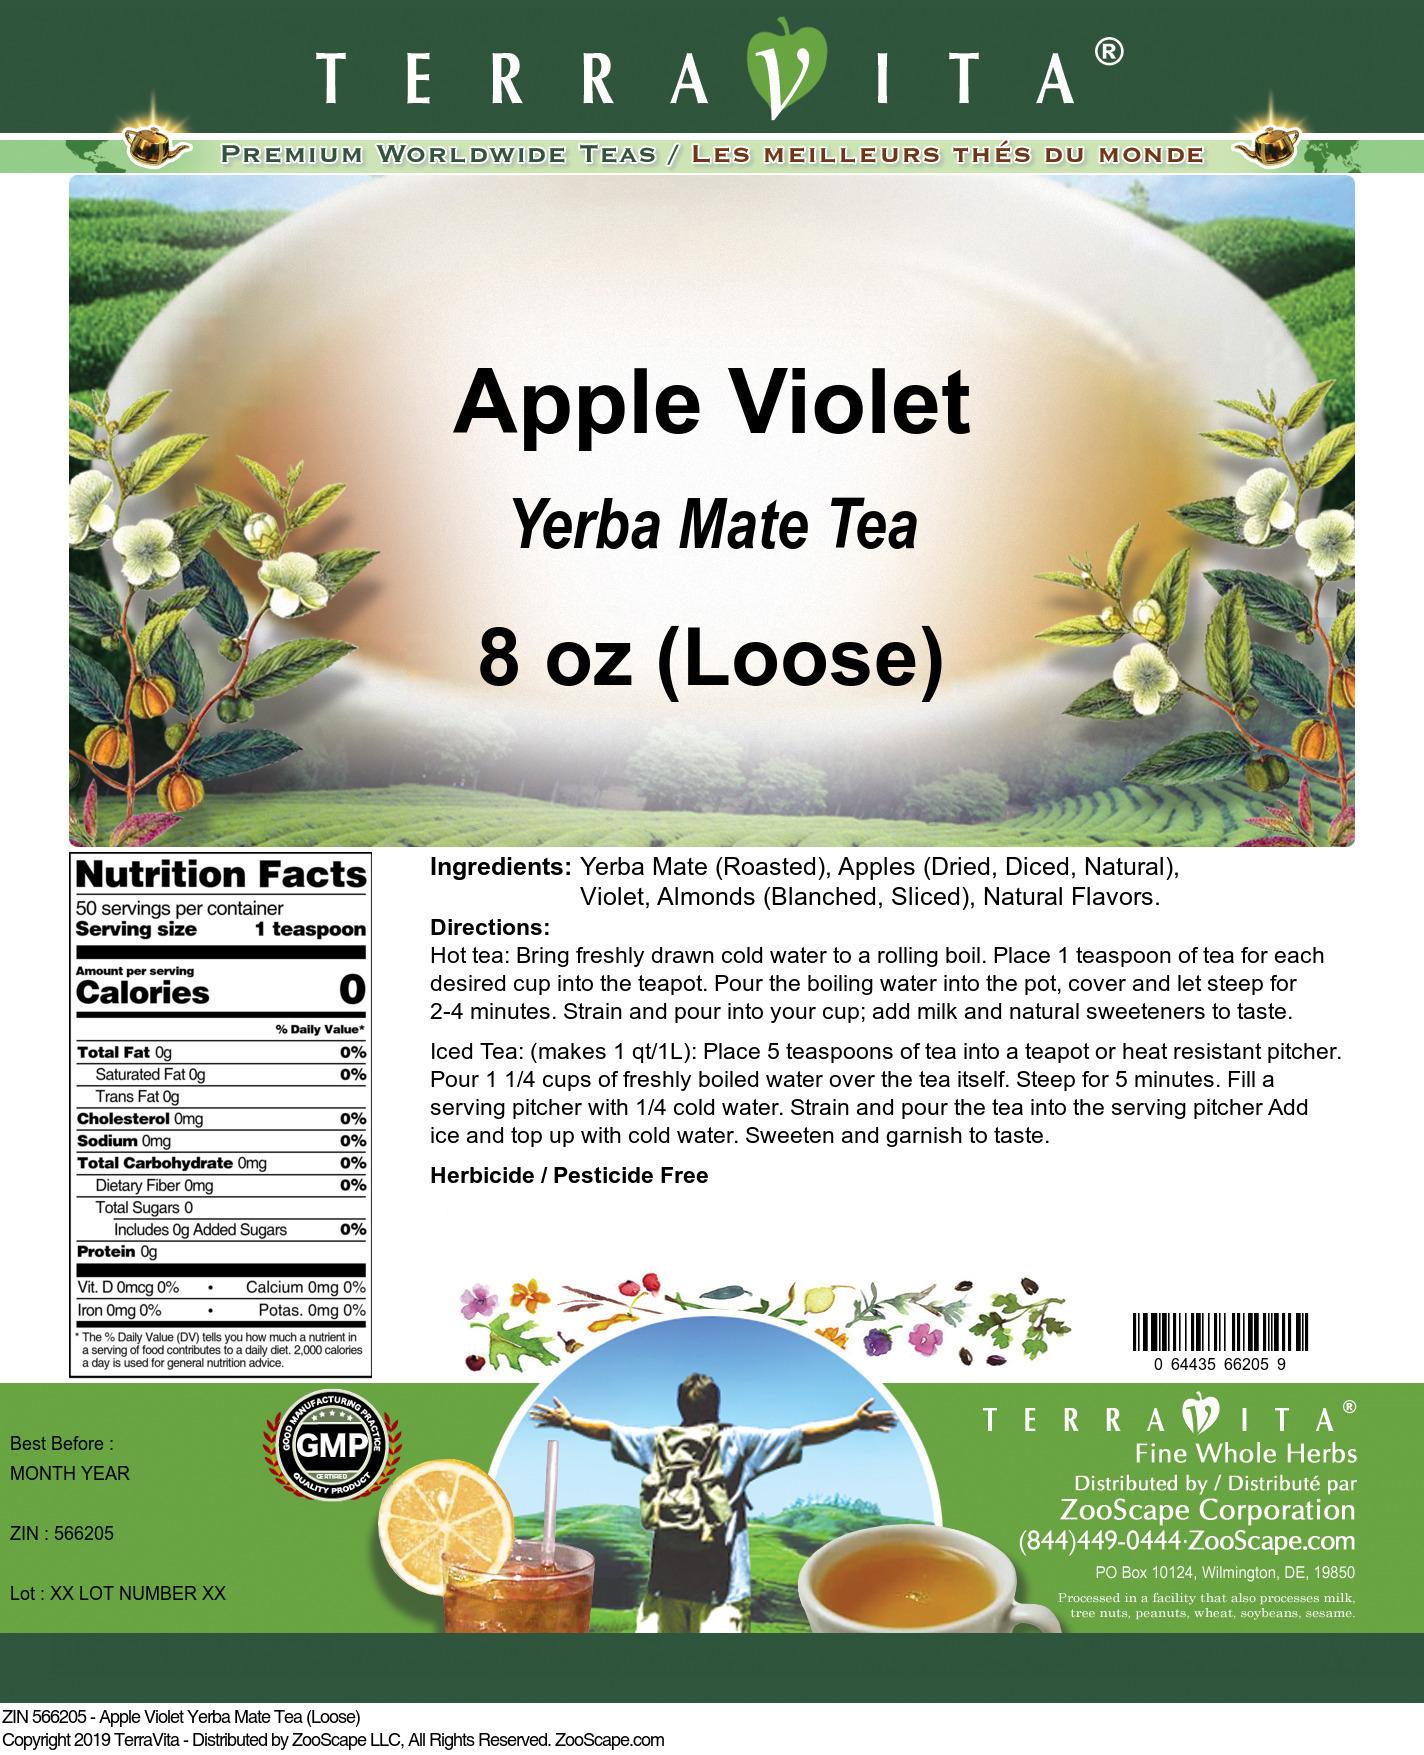 Apple Violet Yerba Mate